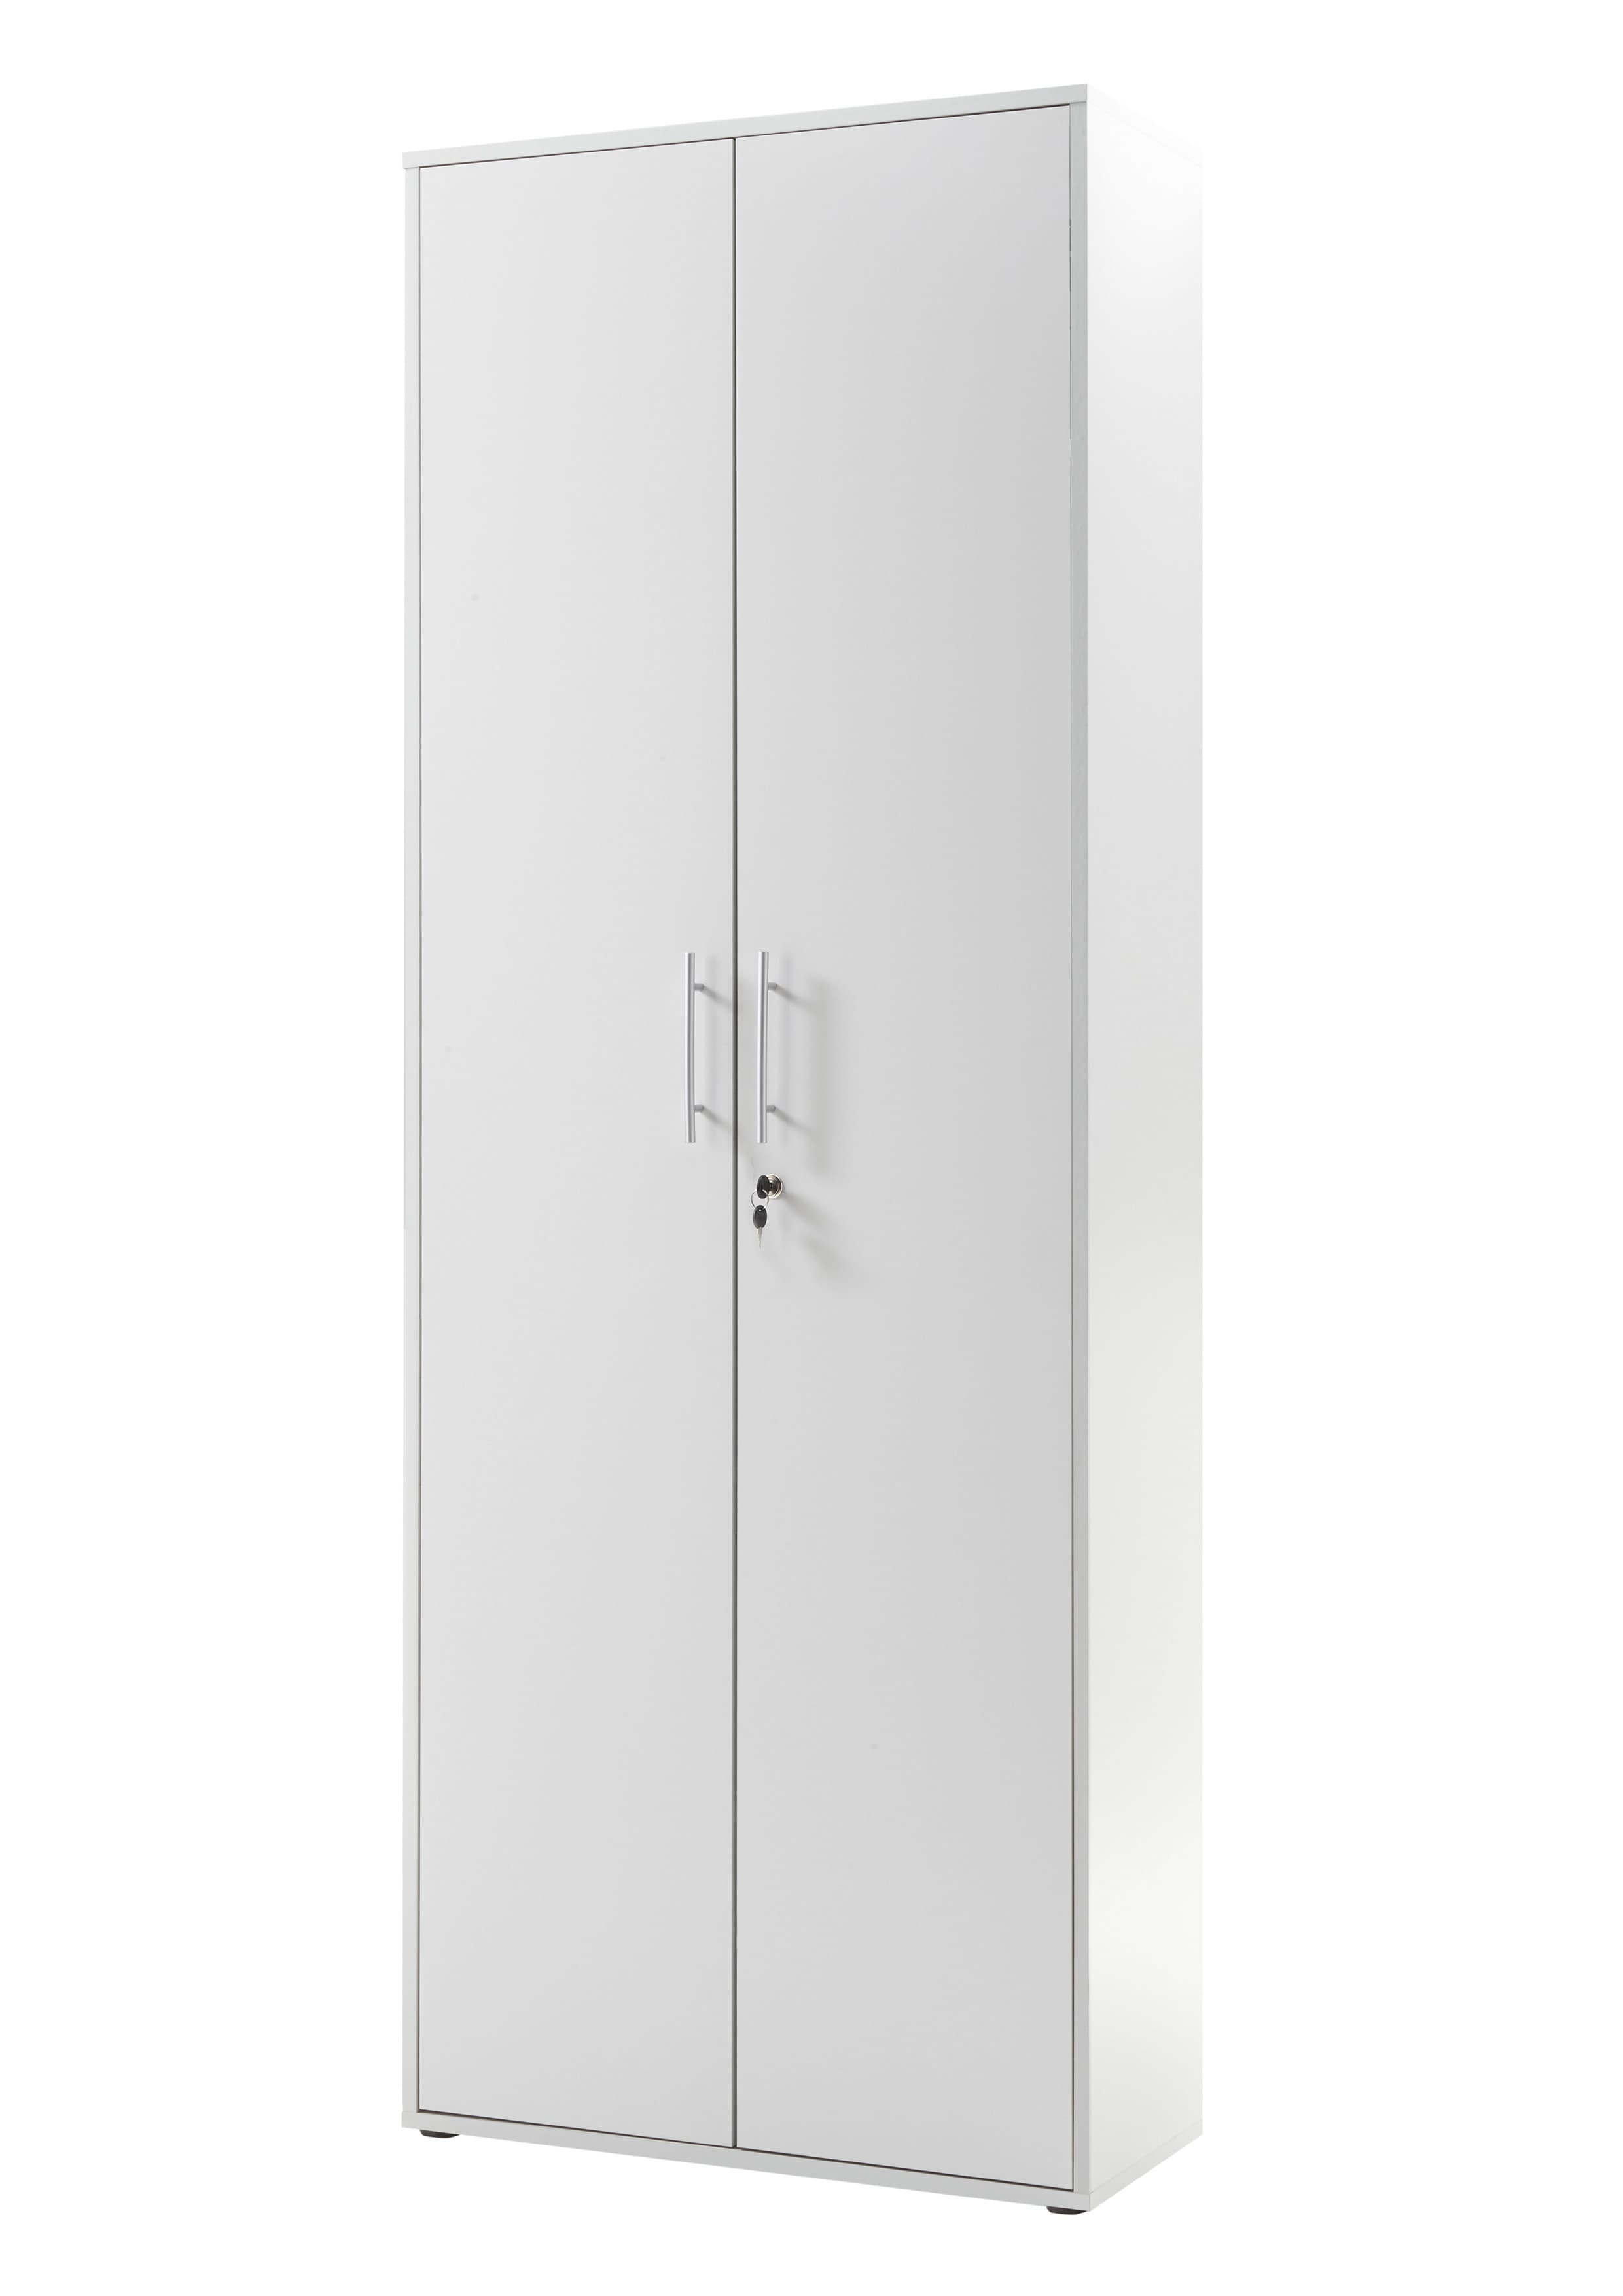 Dulap din pal, cu 2 usi Prato Gri deschis, l80xA35xH216 cm